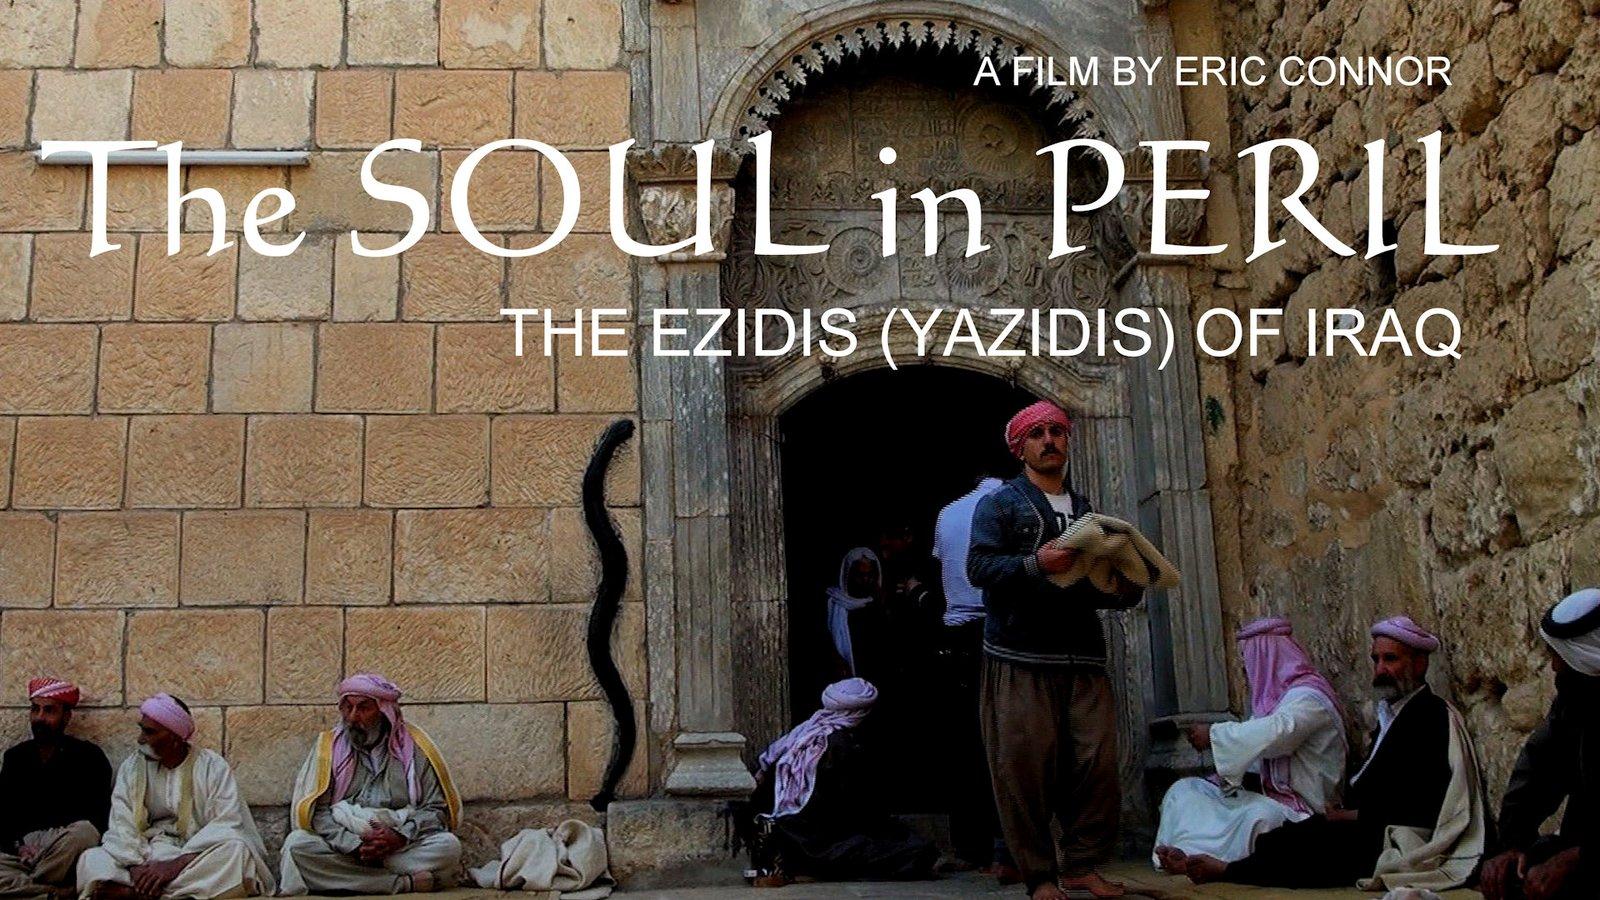 The Ezidis of Iraq (Yazidis)…The Soul in Peril